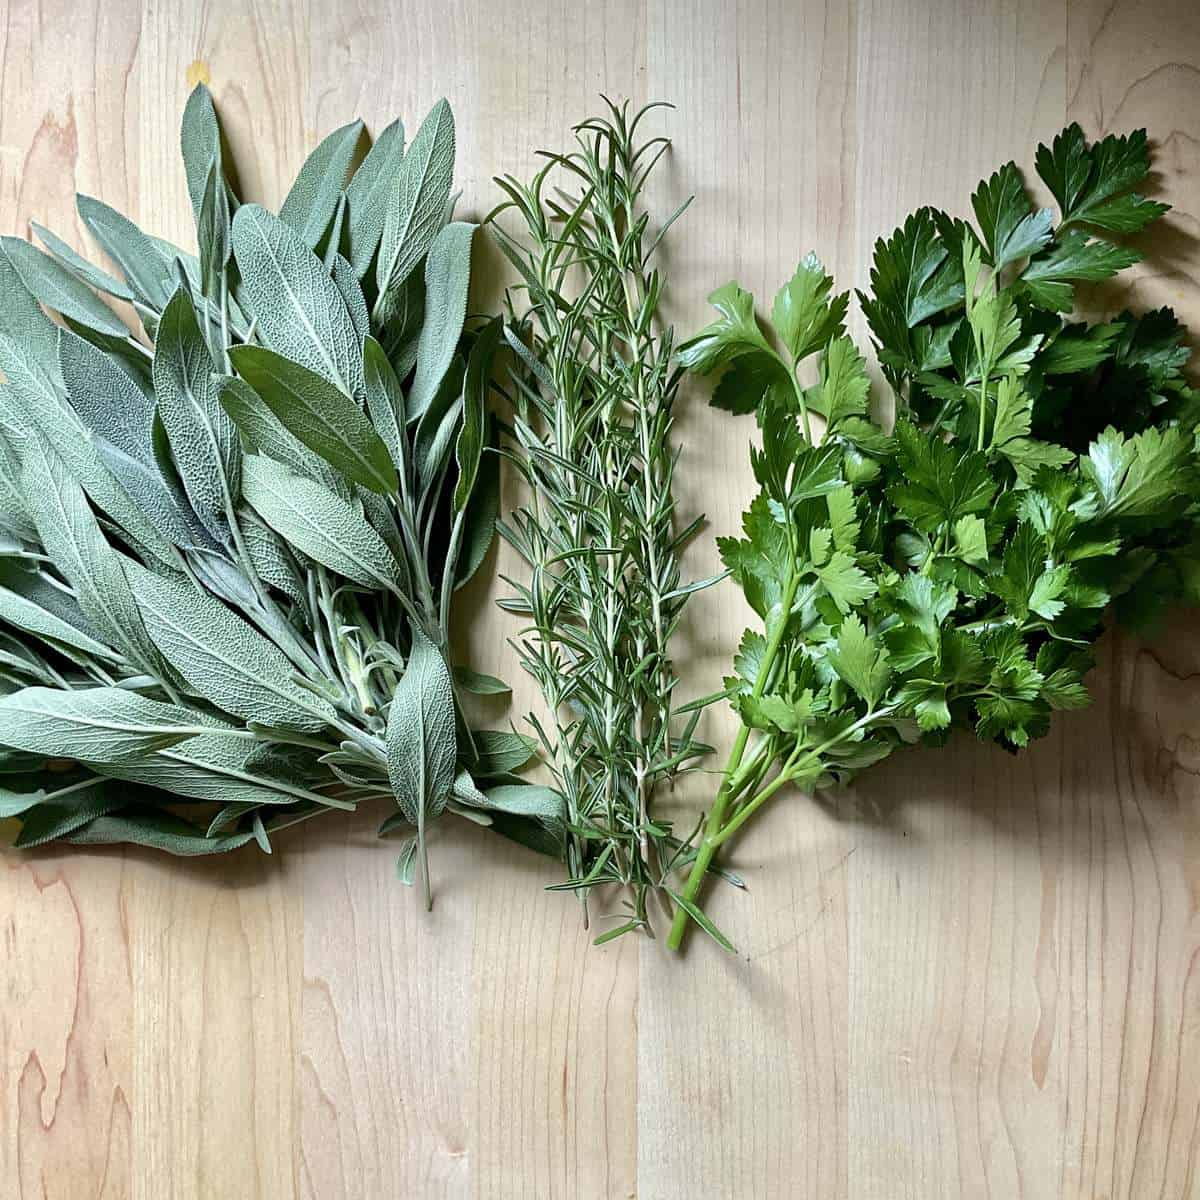 Fresh herbs on a wooden board.